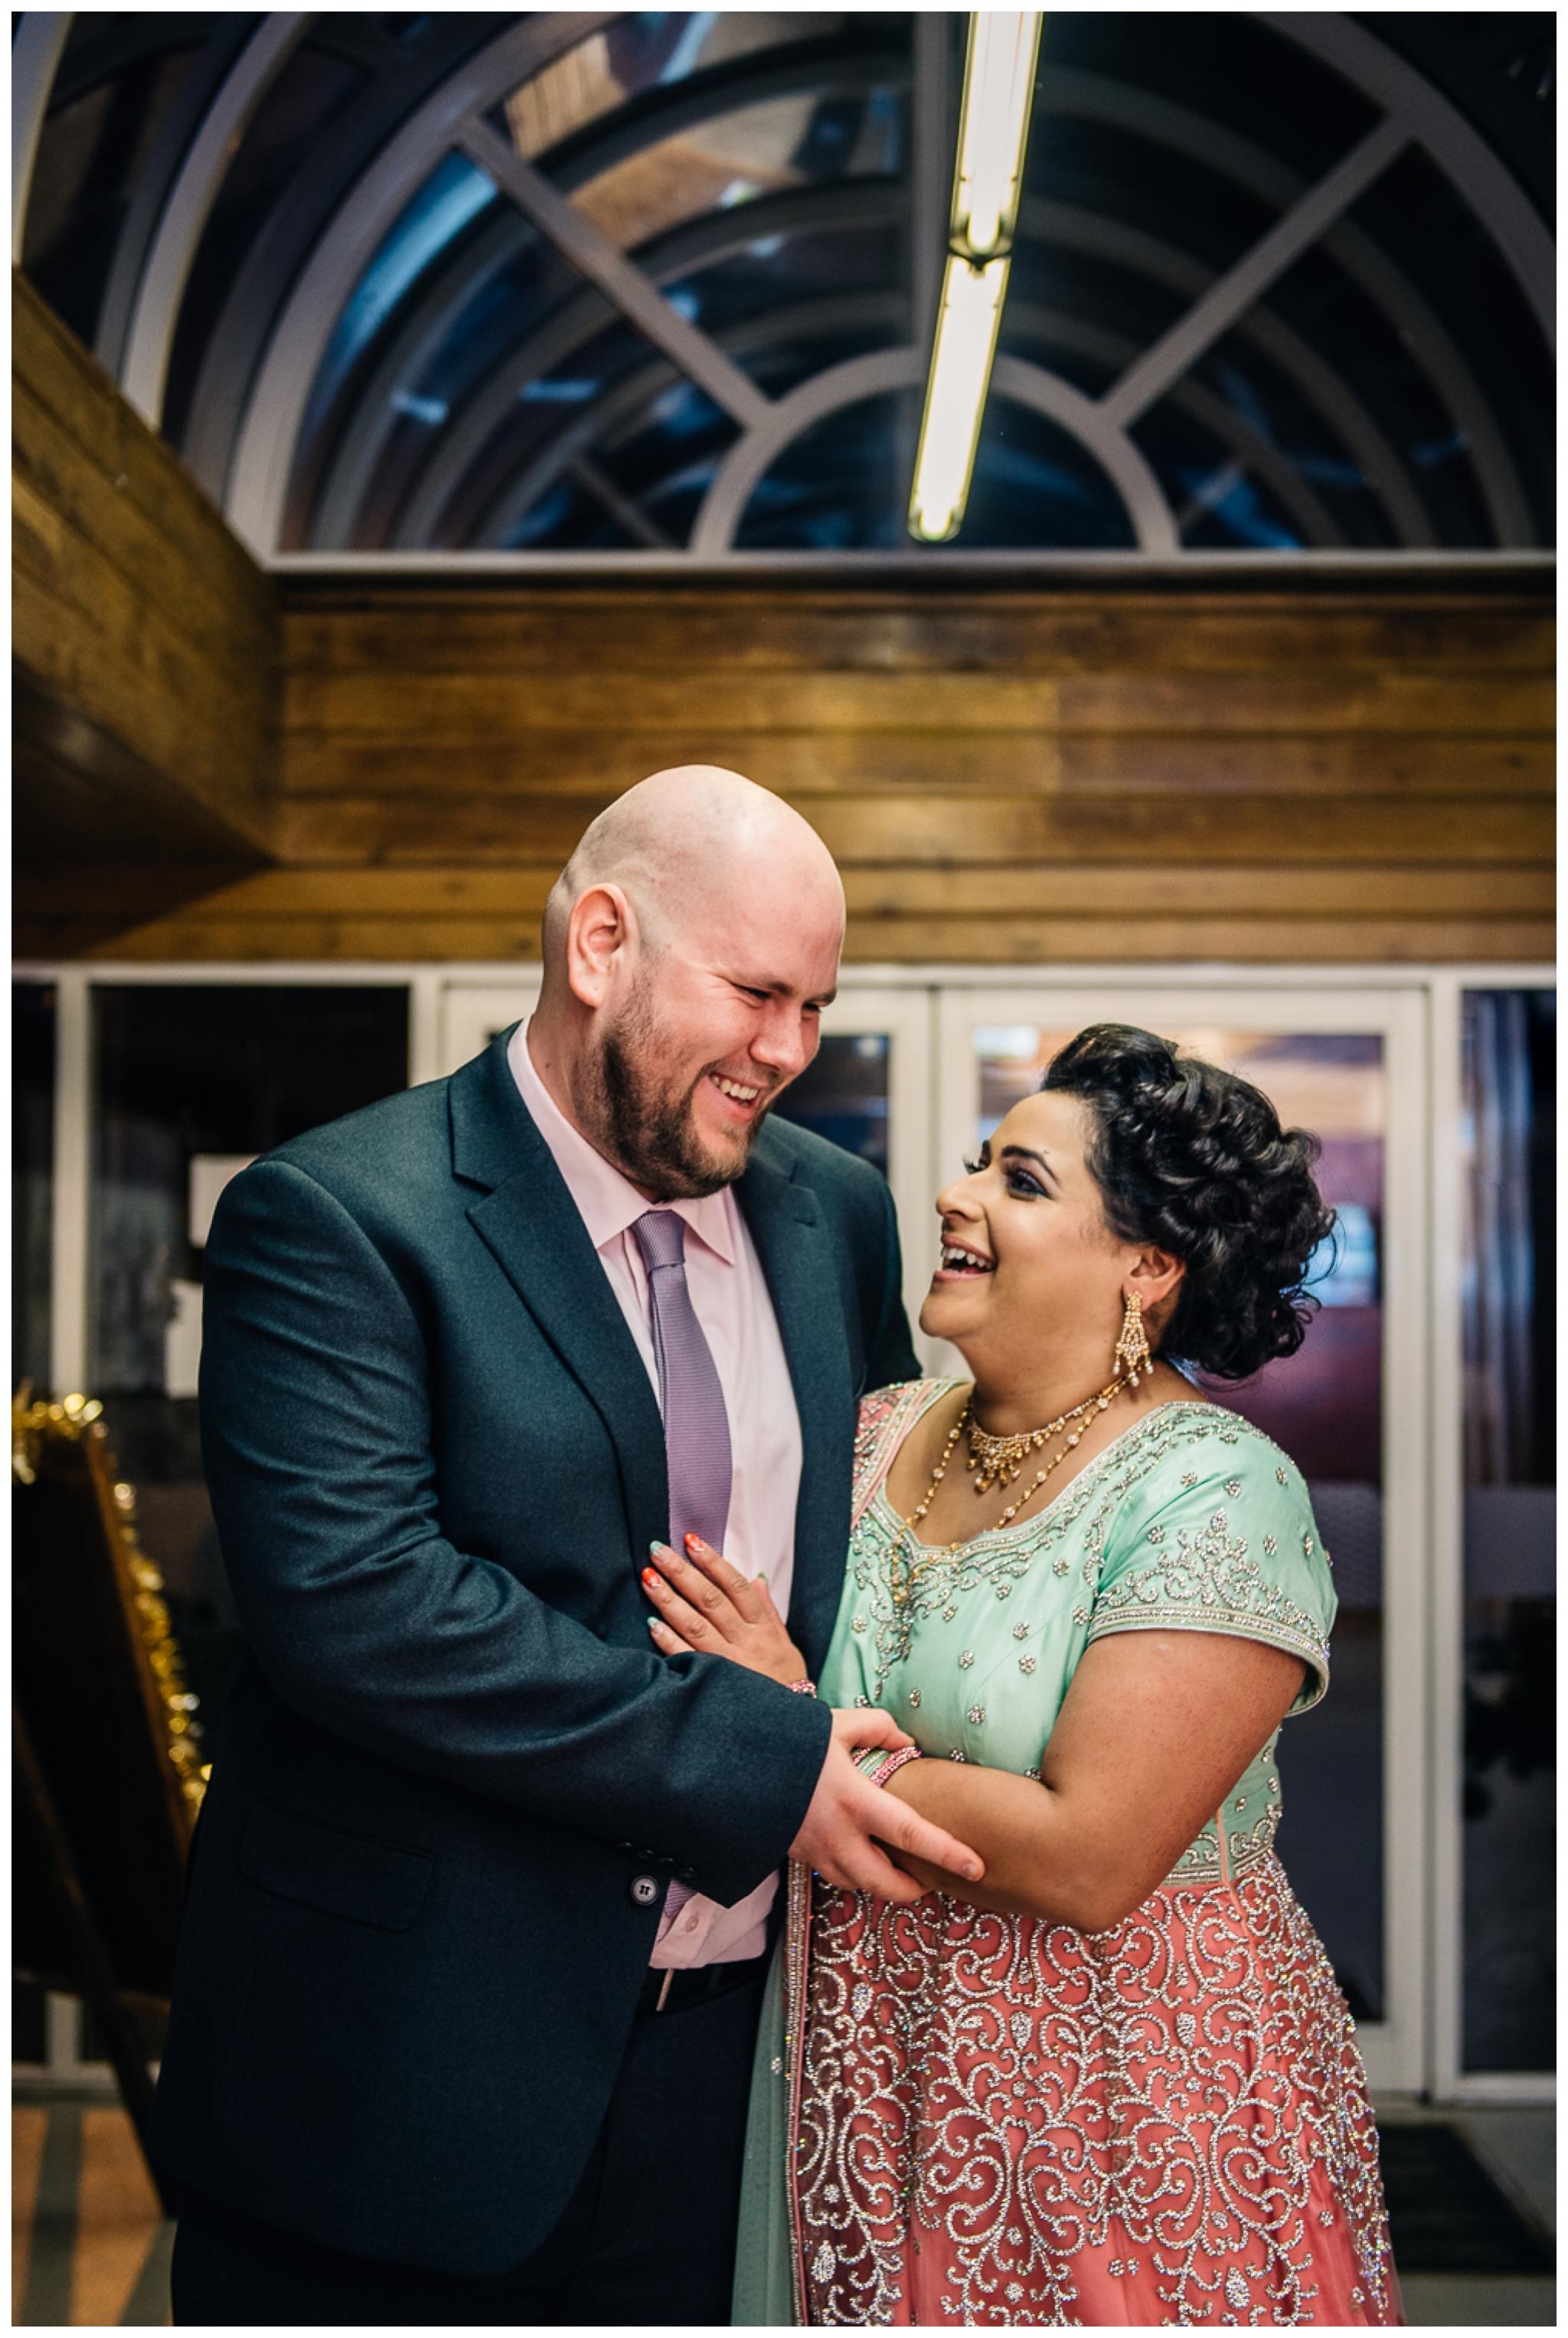 Nikki-Cooper-Photography-Autumn-Wedding-Shrewsbury_0057.jpg